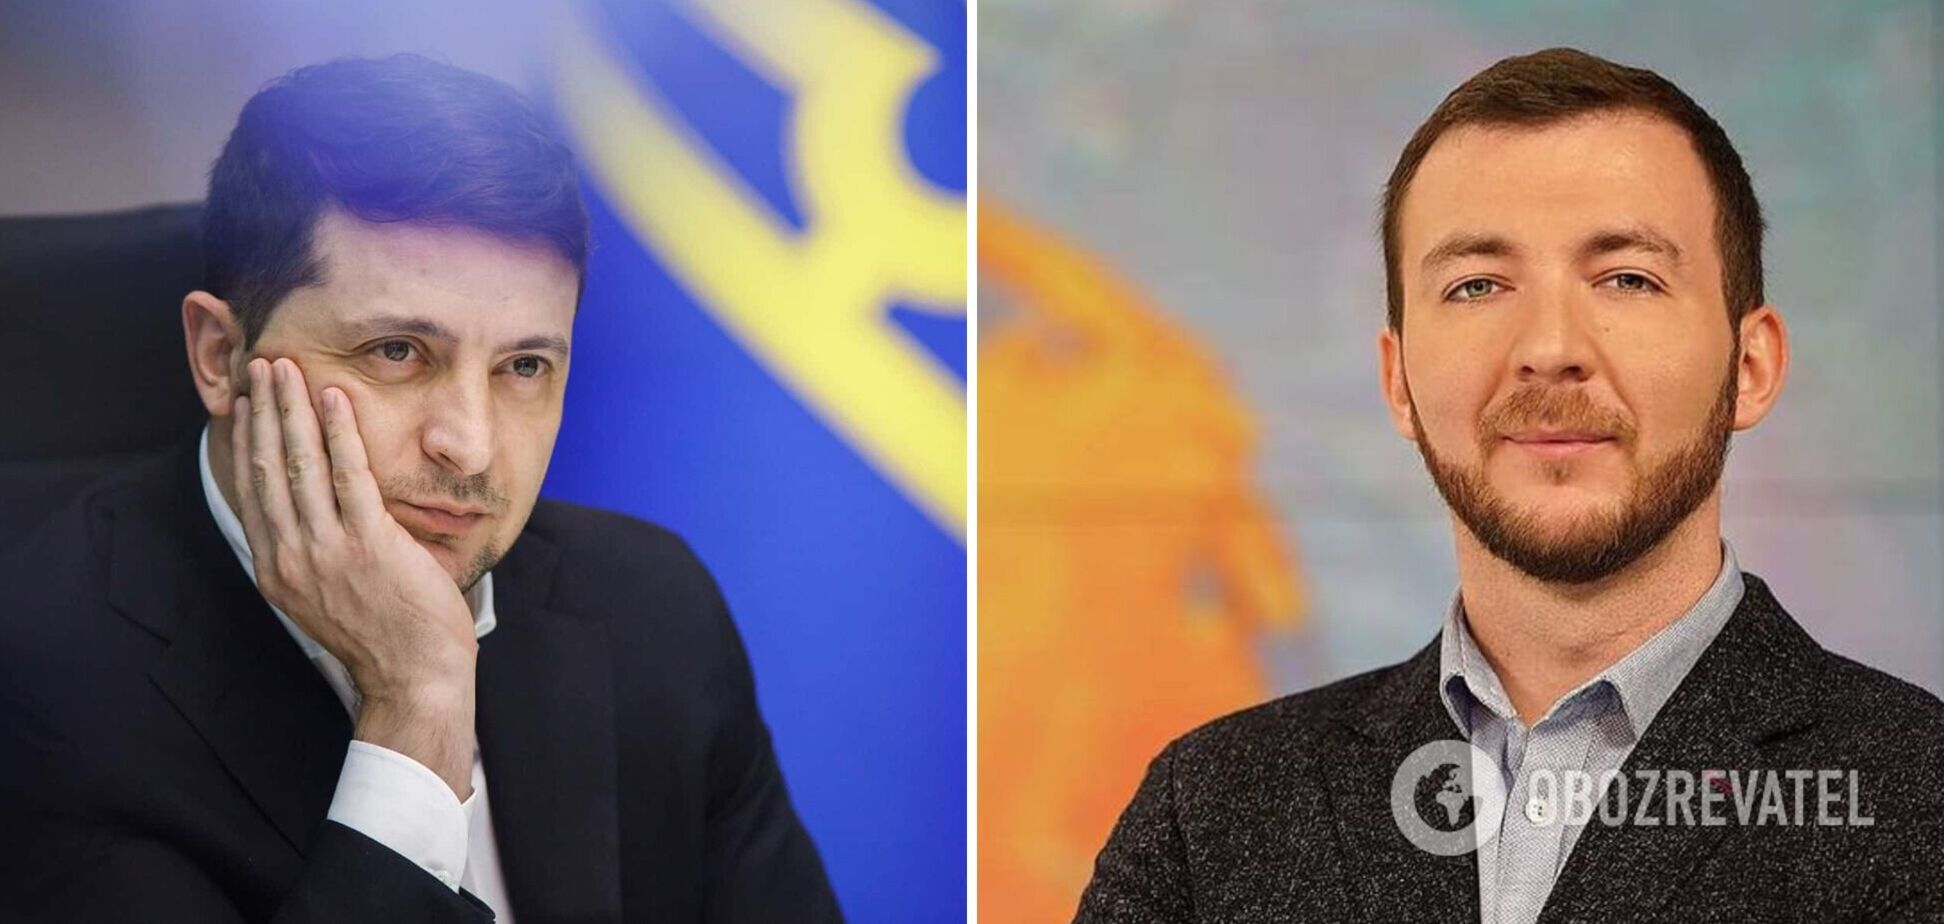 Зеленский назначил Никифорова своим пресс-секретарем